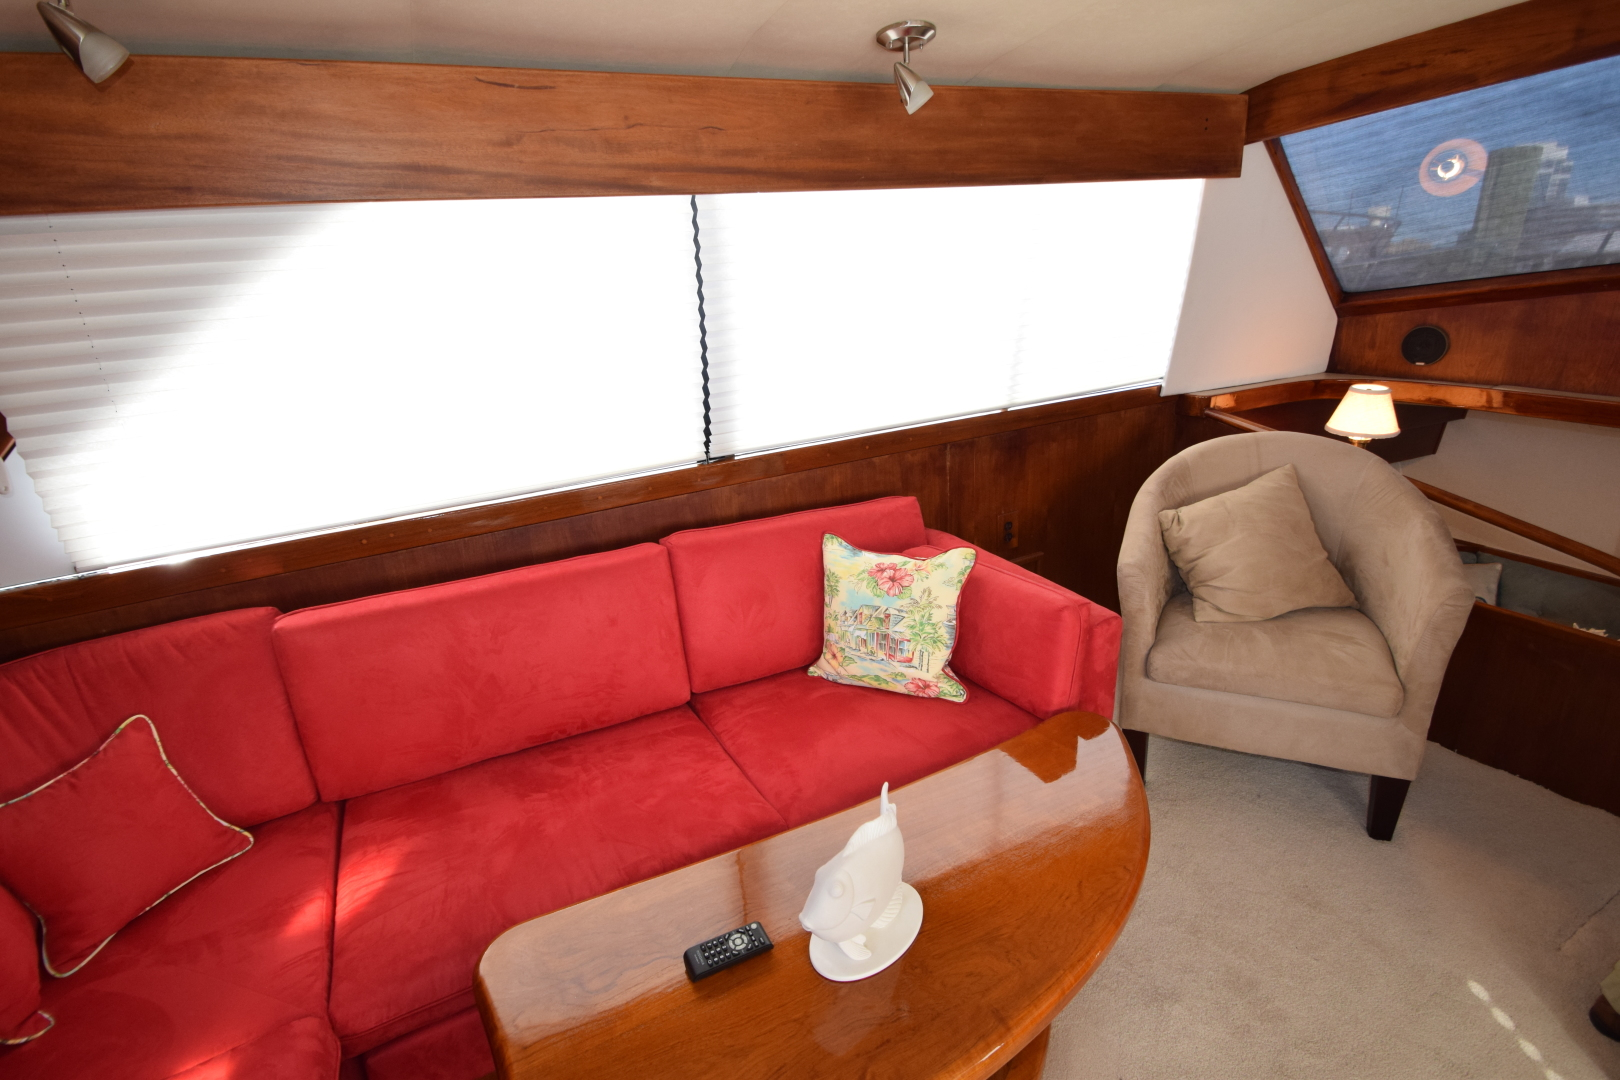 Ocean Yachts-46 Sunliner 1986-Sugah Portsmouth-Virginia-United States-1555524 | Thumbnail